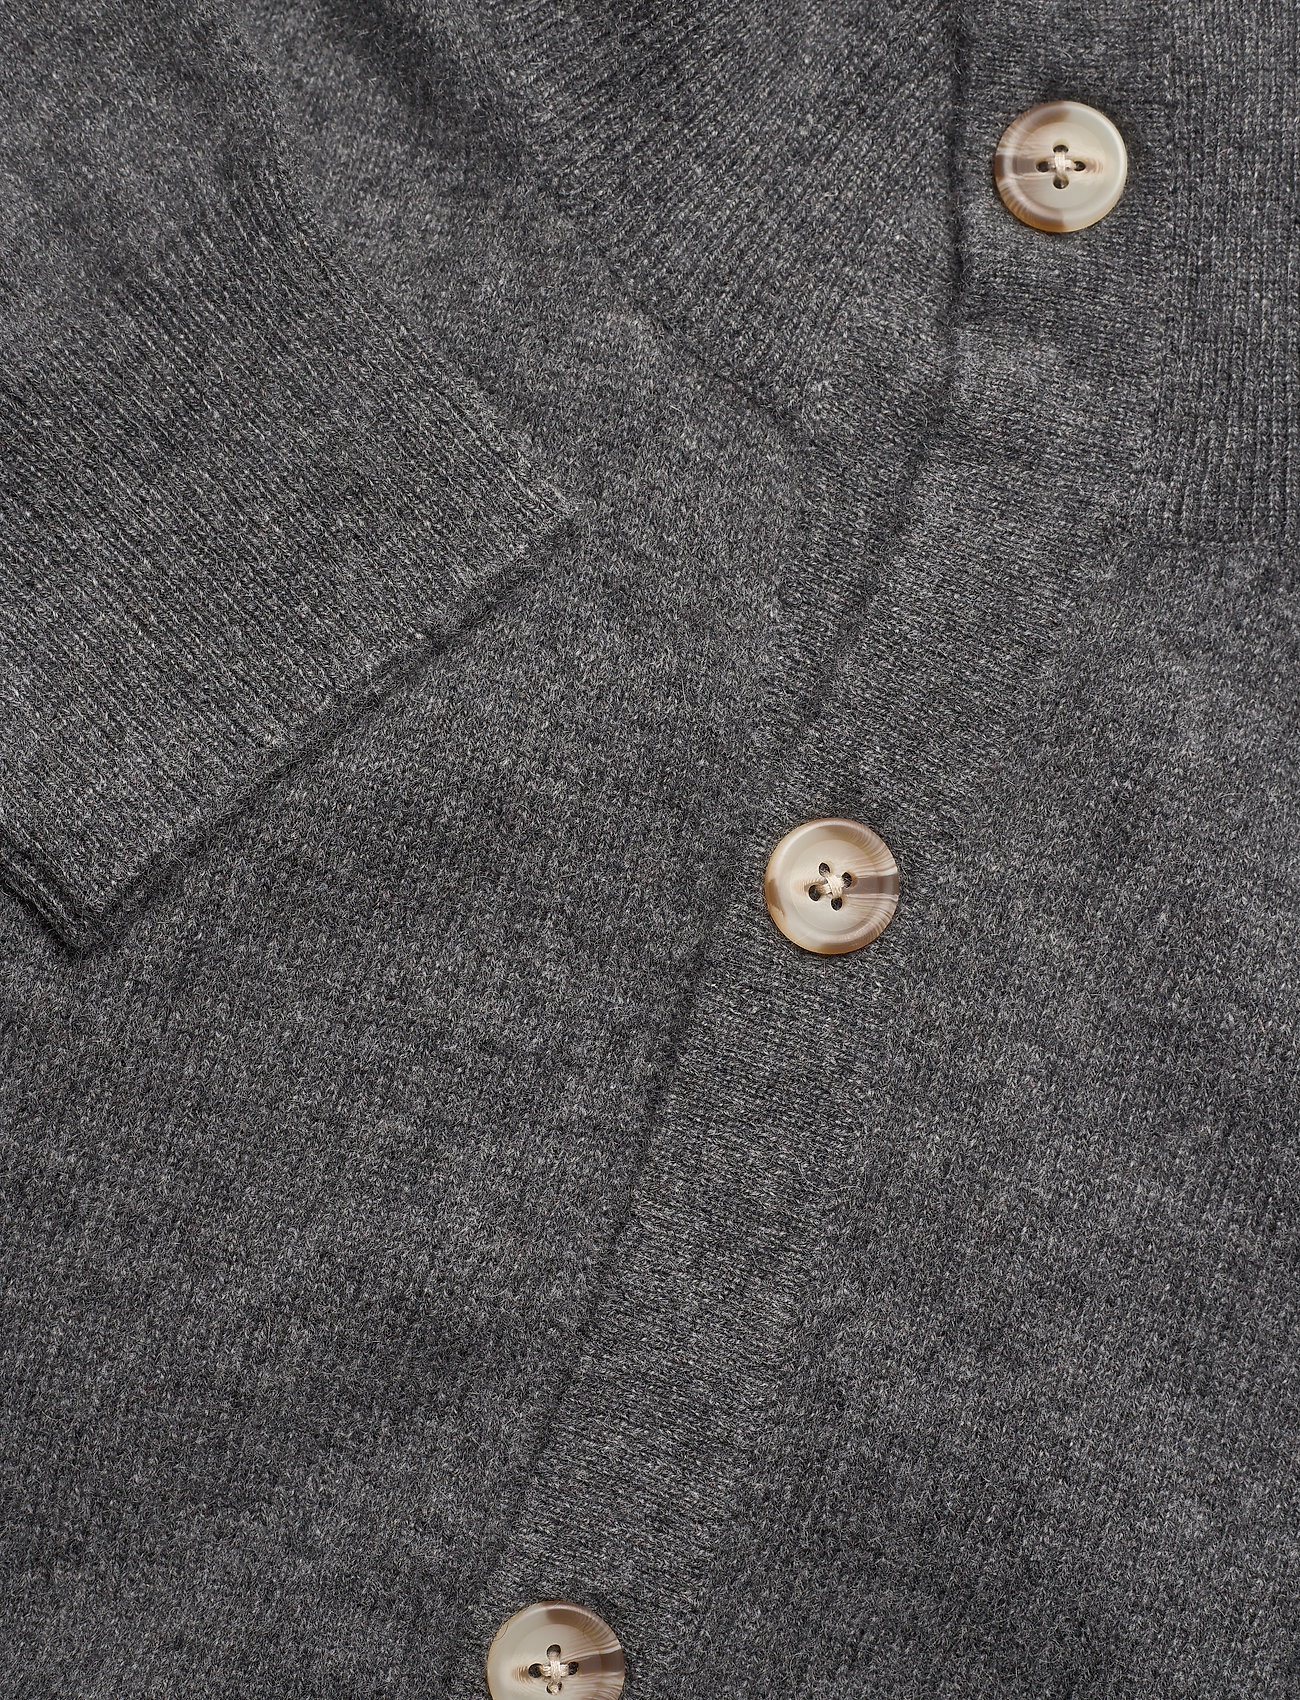 Davida Cashmere Man Cardigan Buttons - Strikkevarer DARK GREY - Menn Klær